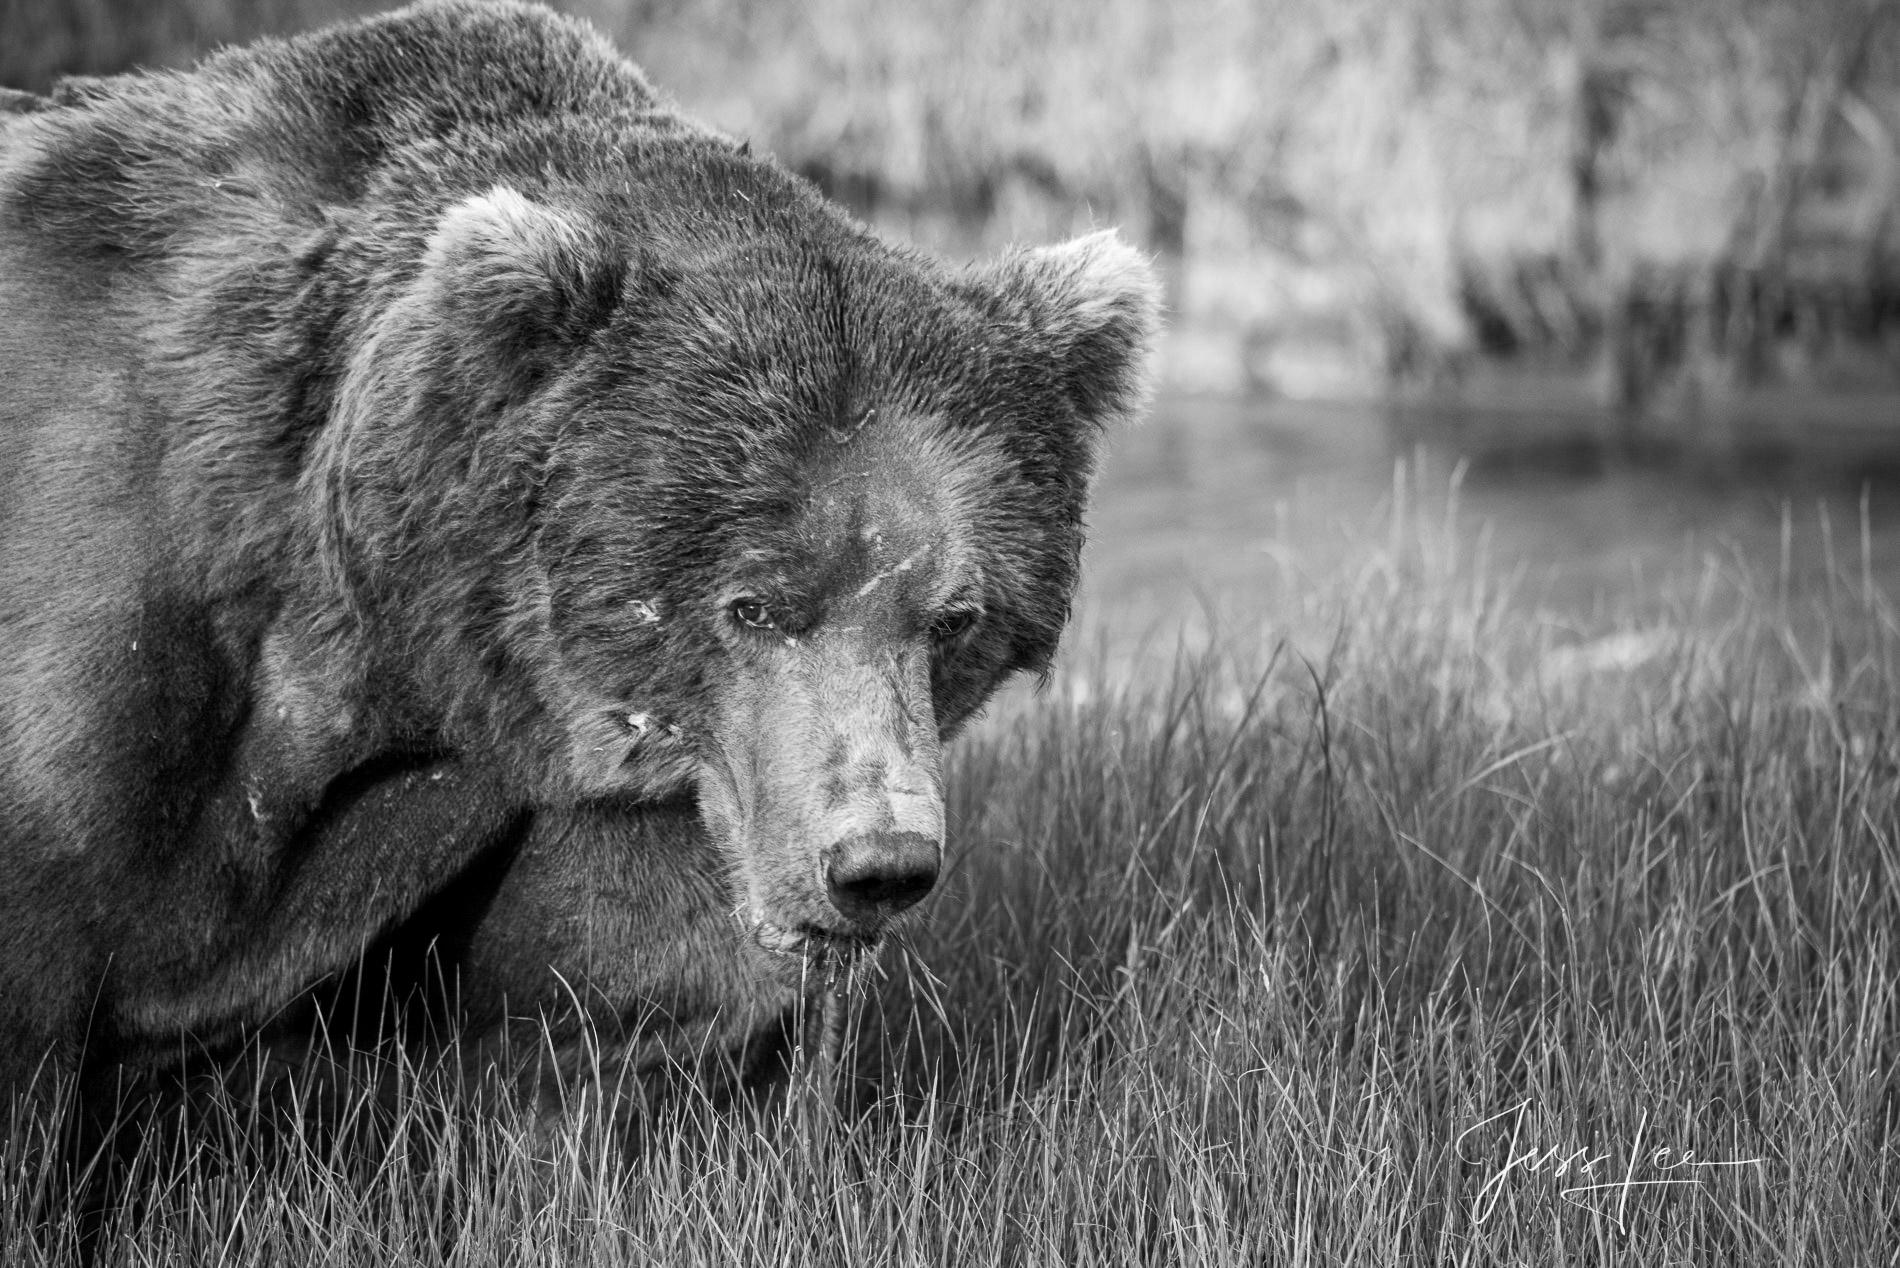 Grizzly, bear, Alaska, print, black and white,, photo